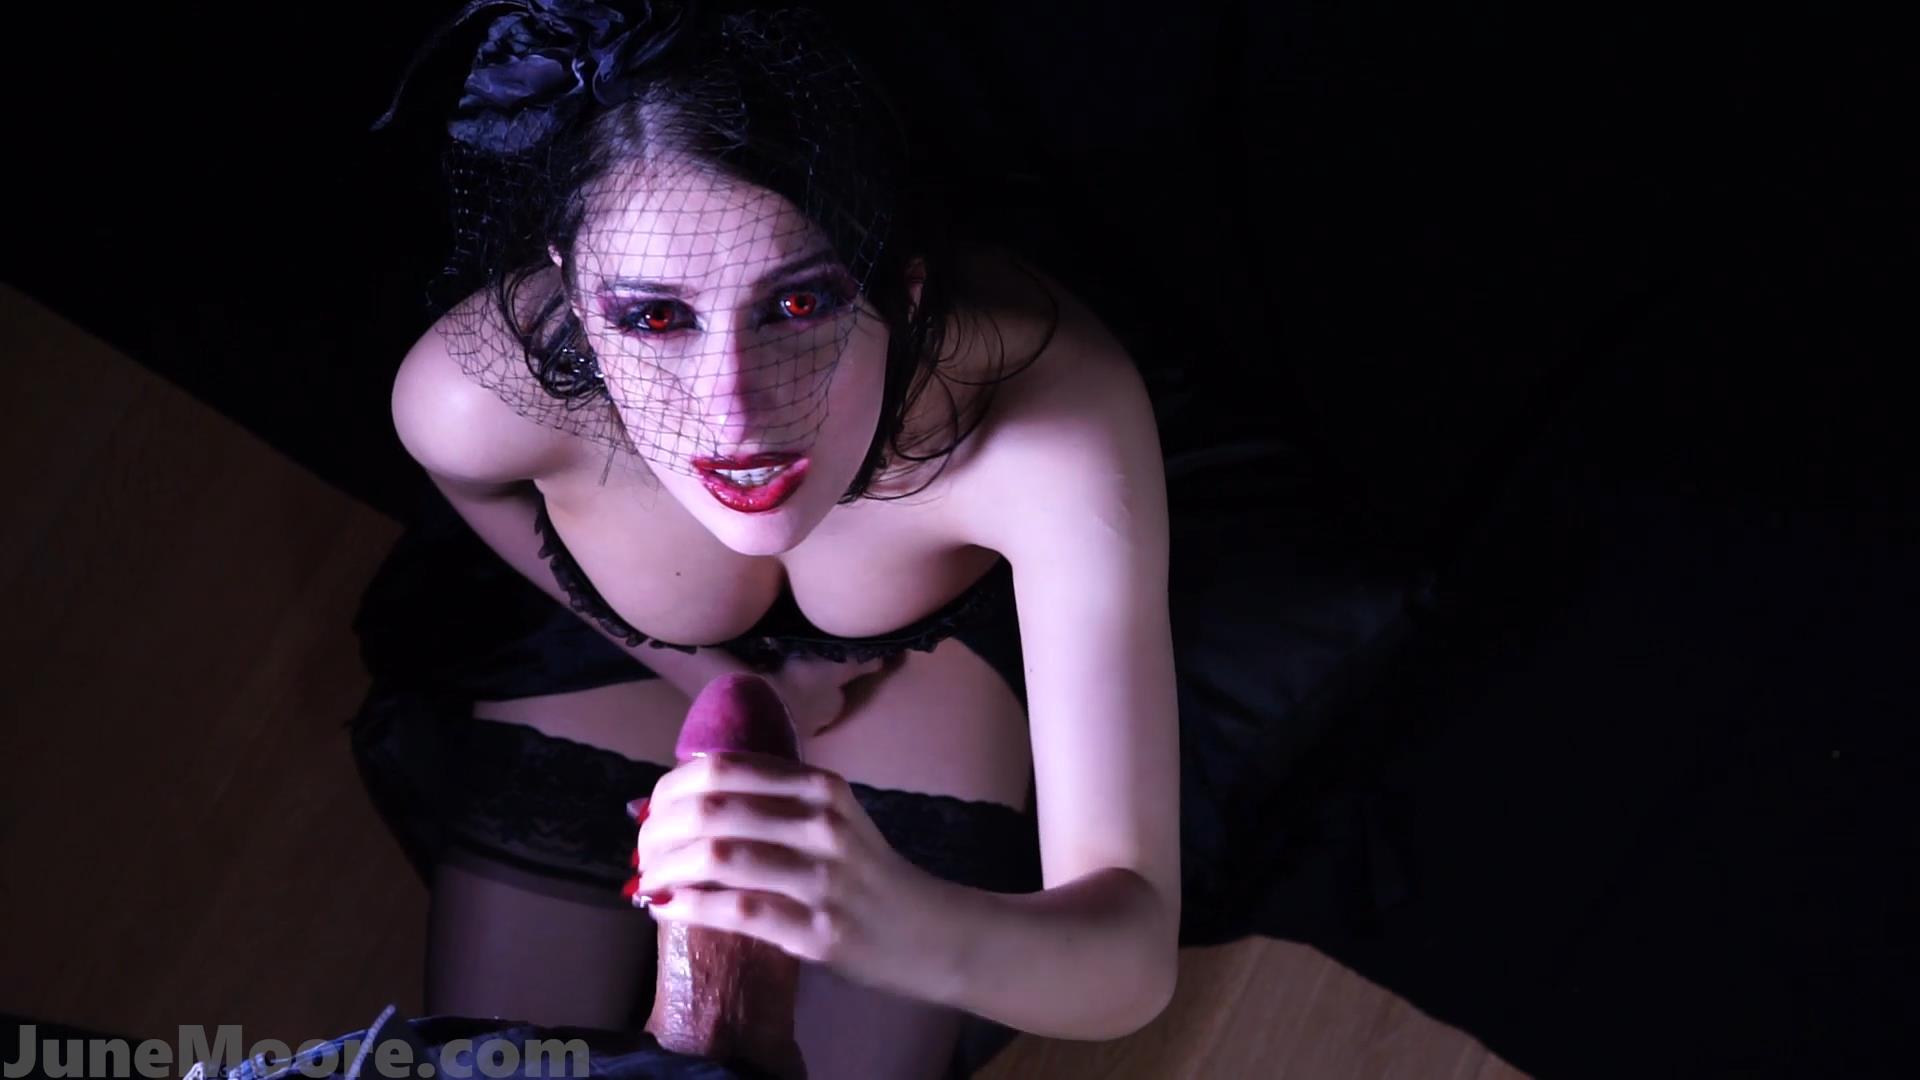 Nikki Brooks B G Porn thirst - b/g vampire handjob blowjob - junemoorexxx 1080p